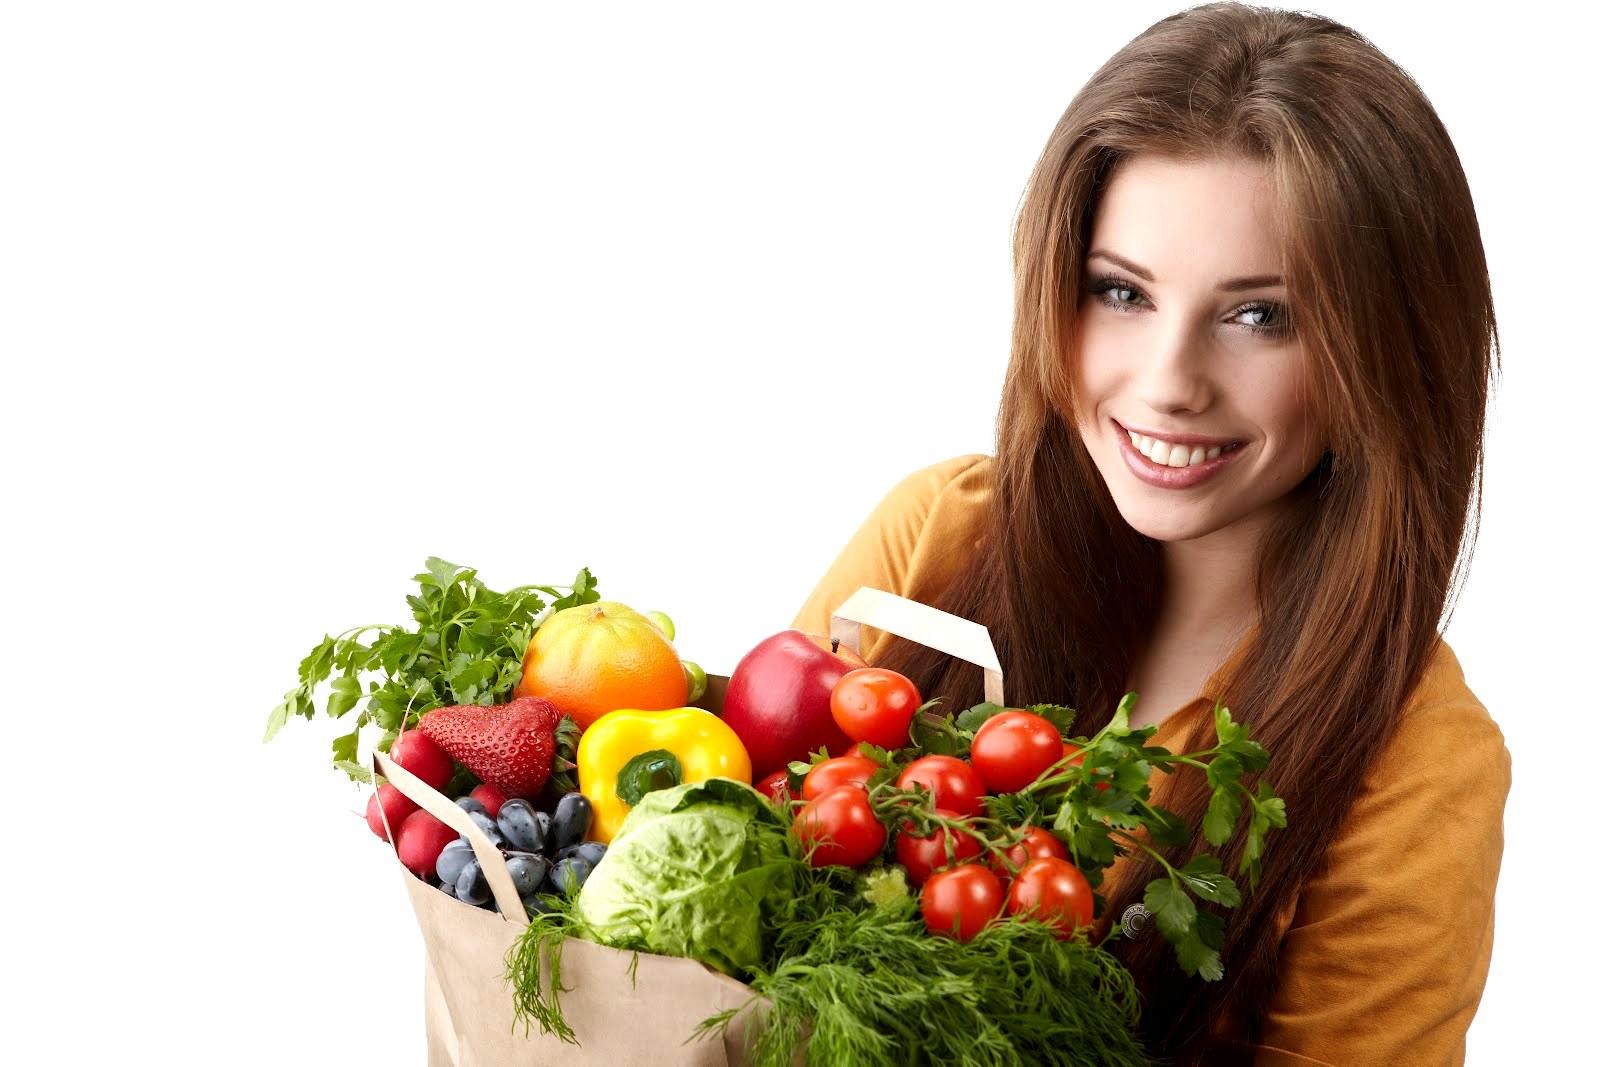 woman_holding_a_fruits_basket_1412021249-1443685427-205x205.jpg